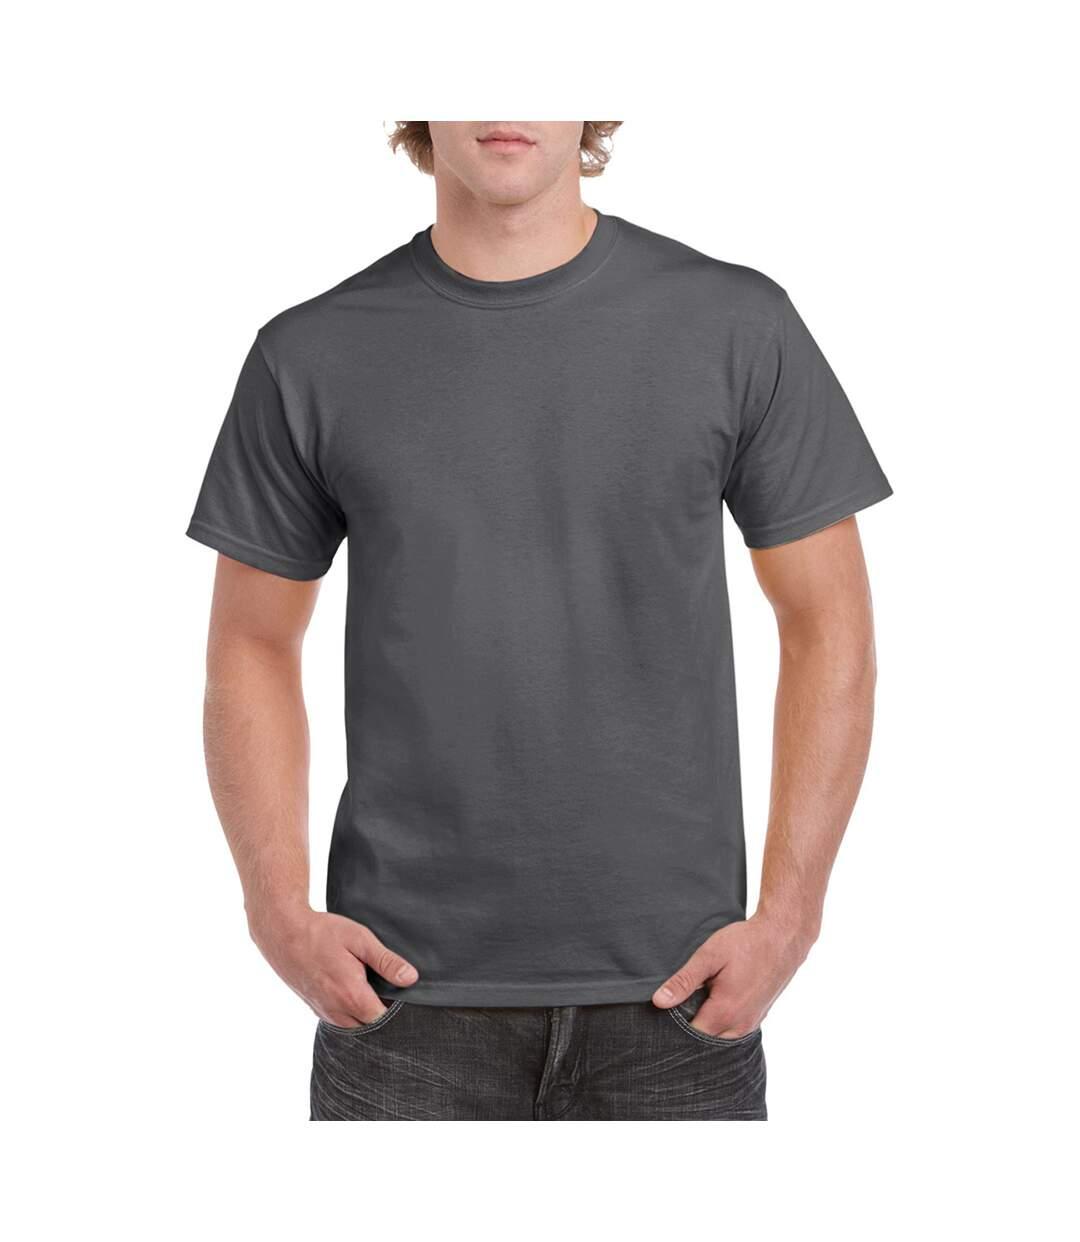 Gildan Mens Heavy Cotton Short Sleeve T-Shirt (Dark Heather) - UTBC481